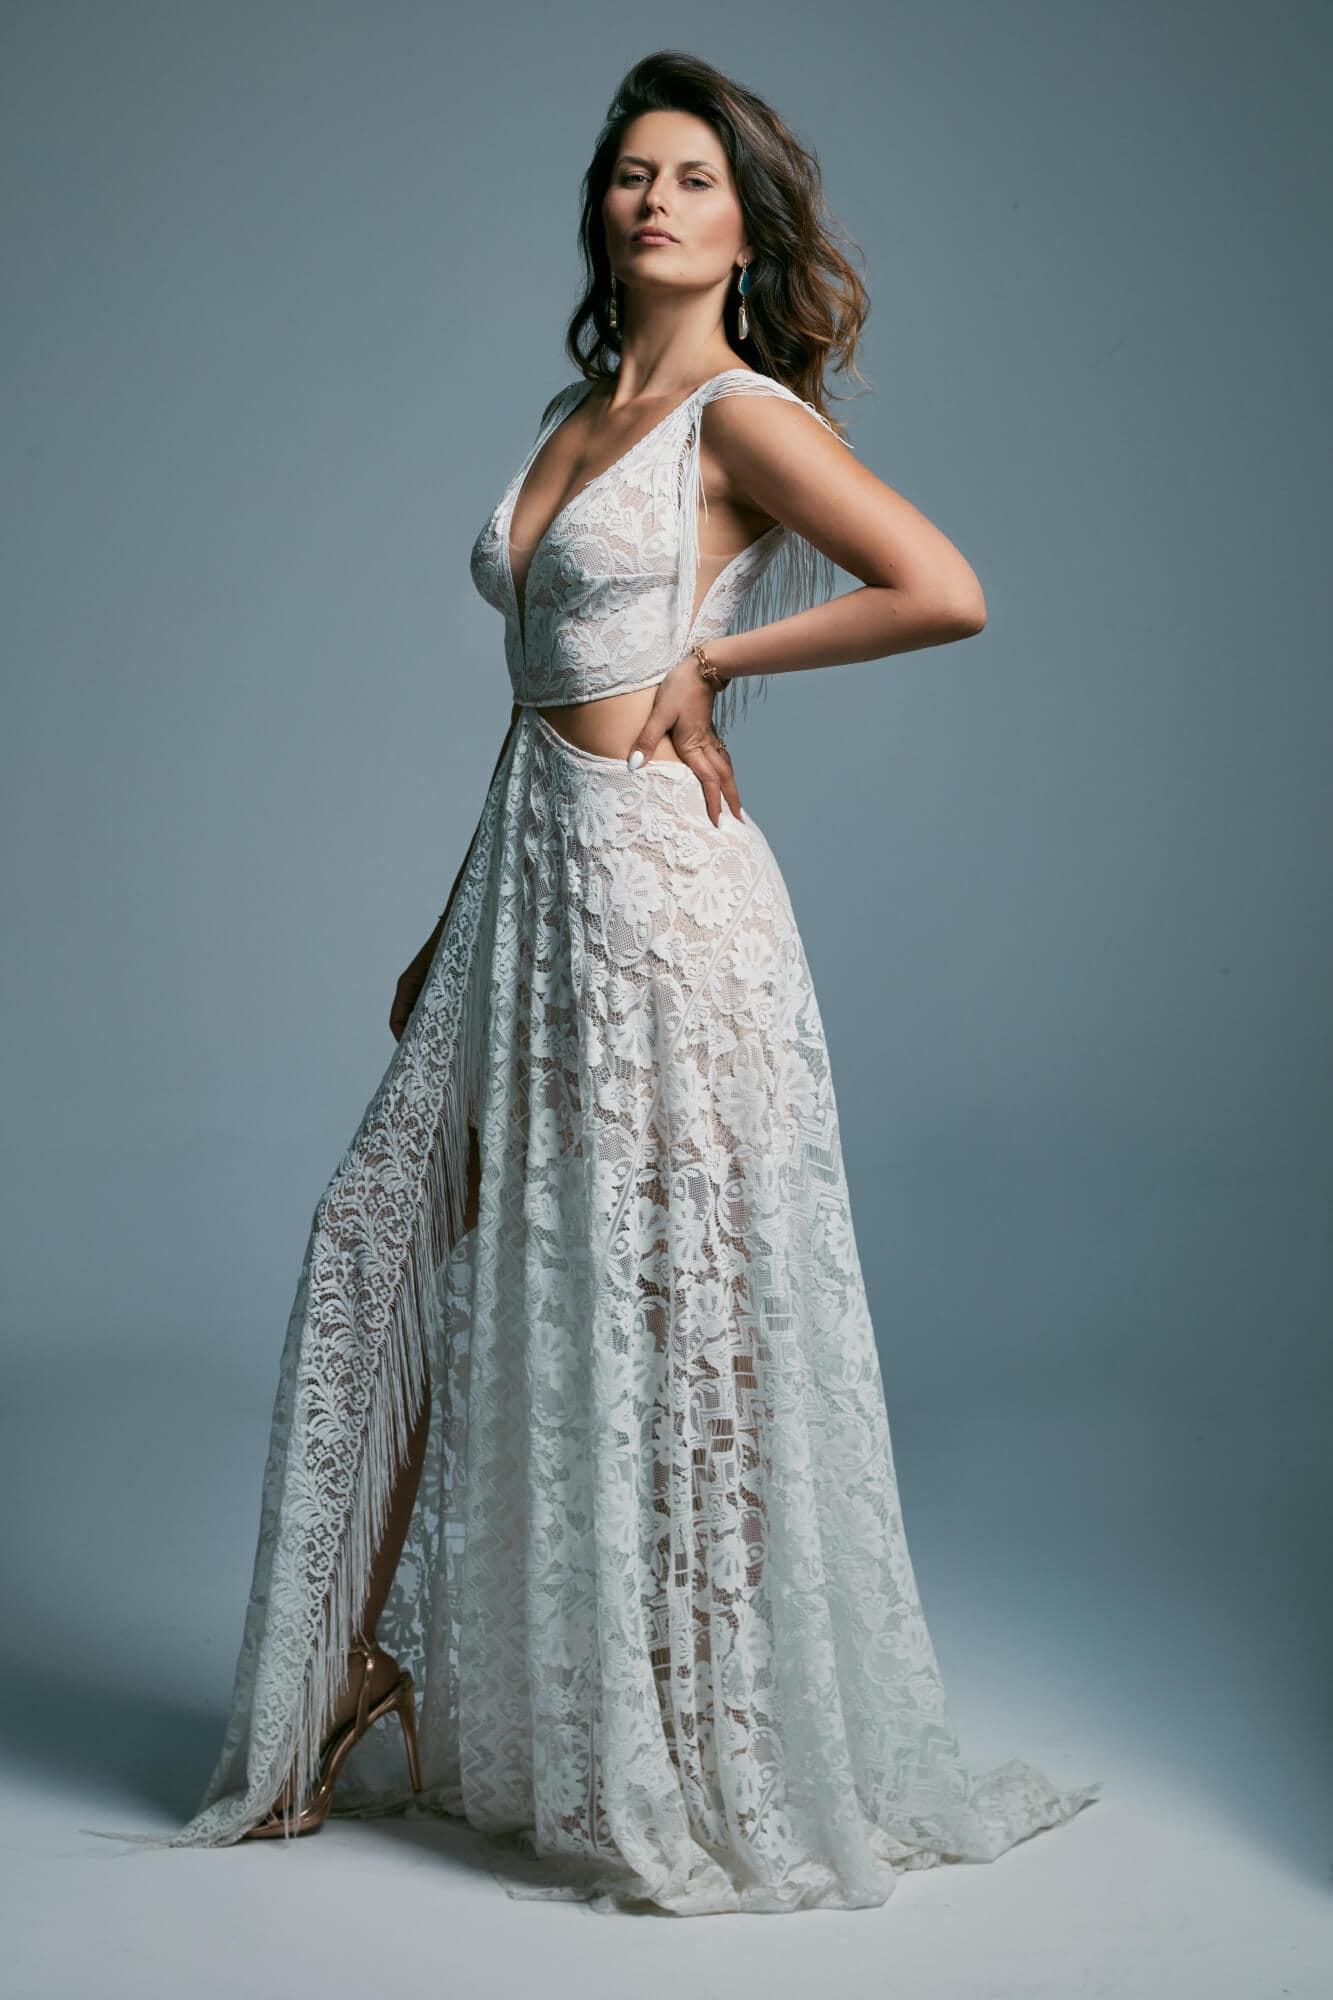 One of a kind, extravagant wedding dress. Porto 43